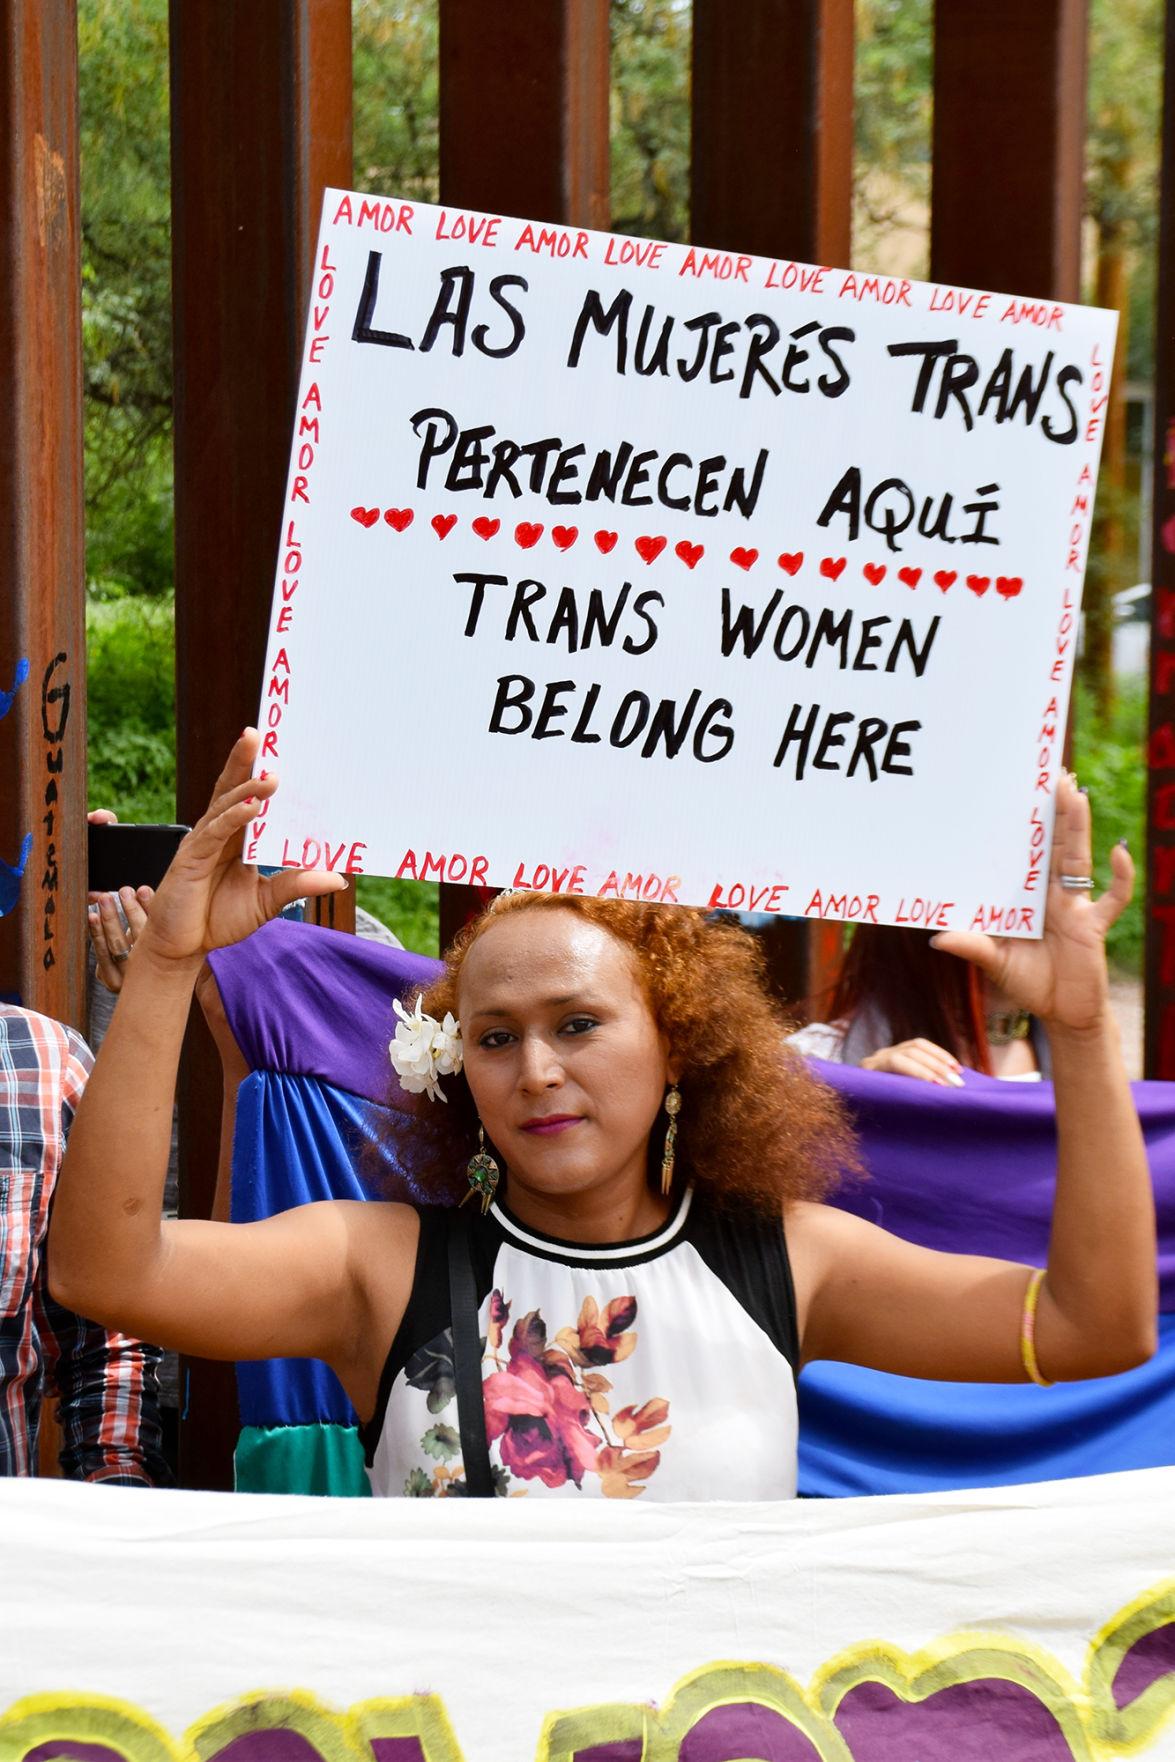 Trans migrante